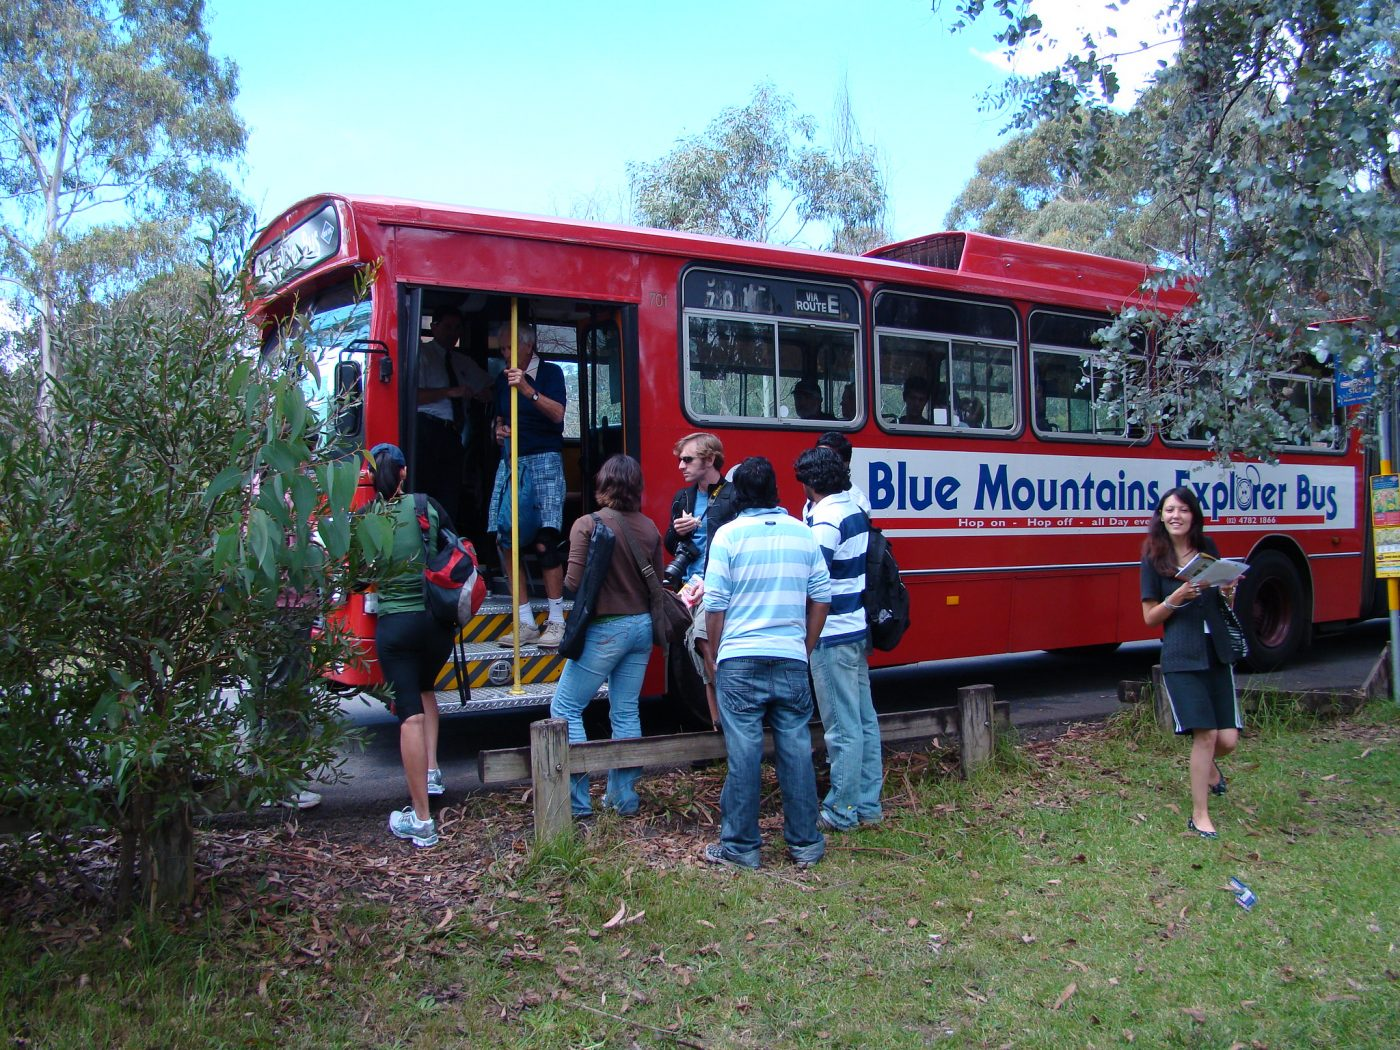 Blue mountains day trip bus